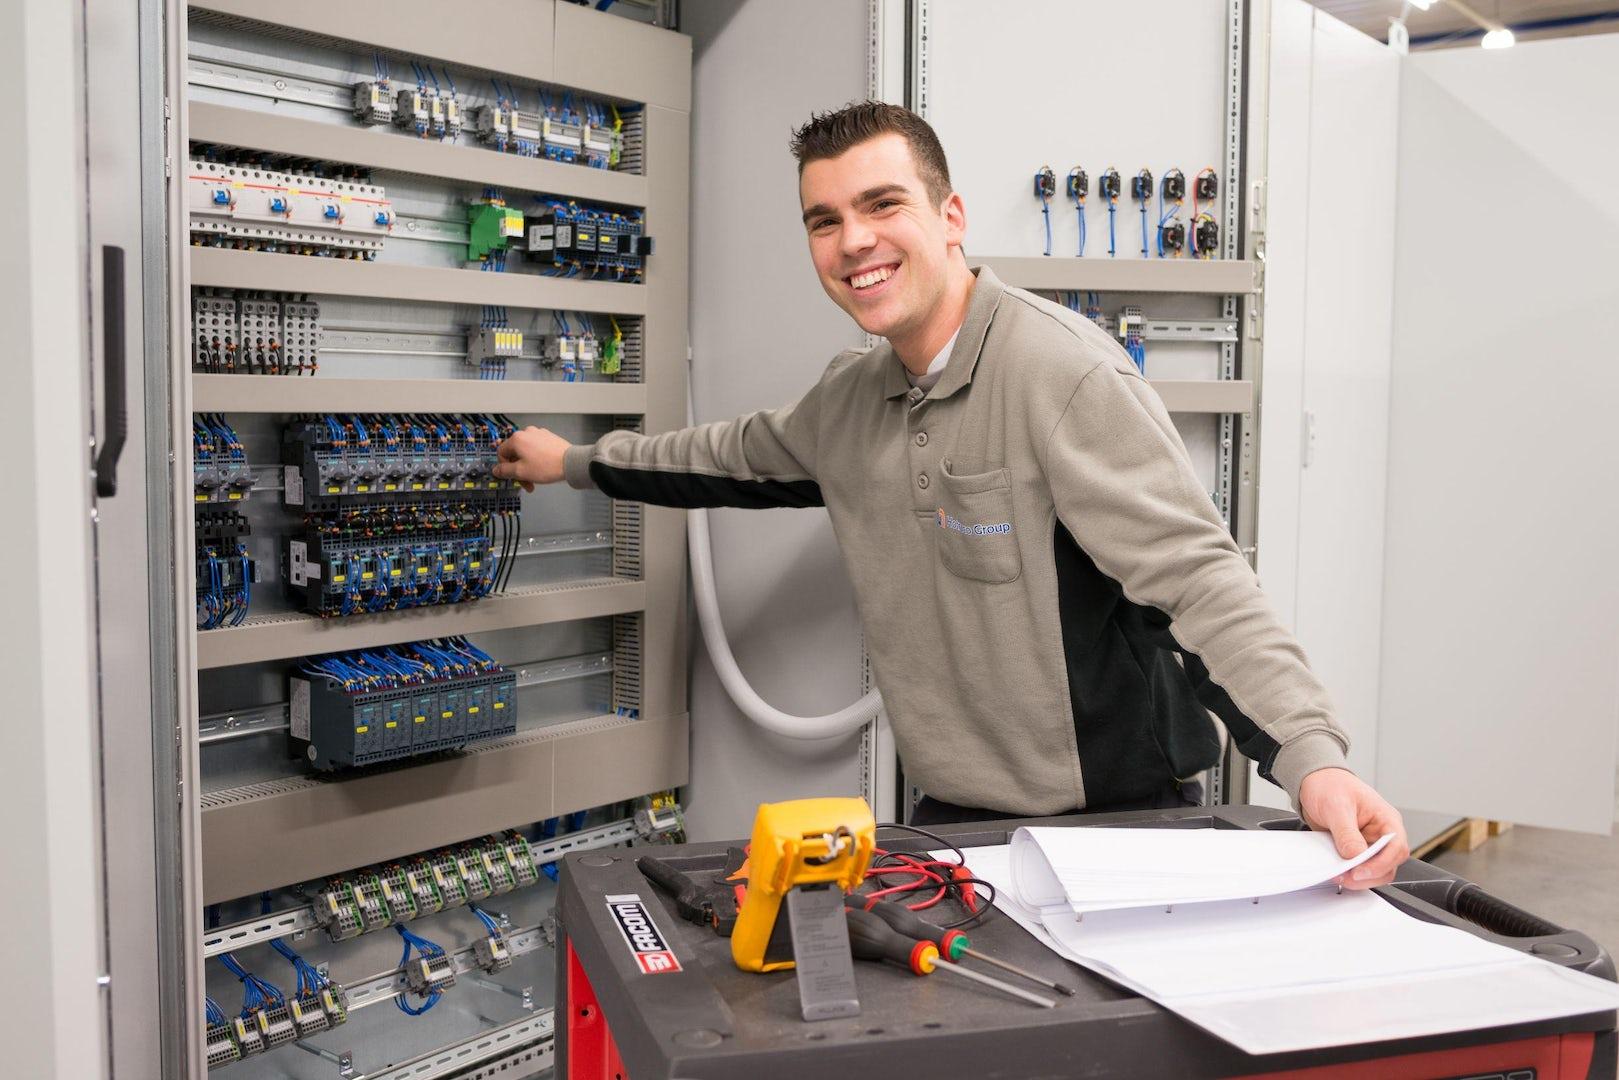 Industrial service onderhoud